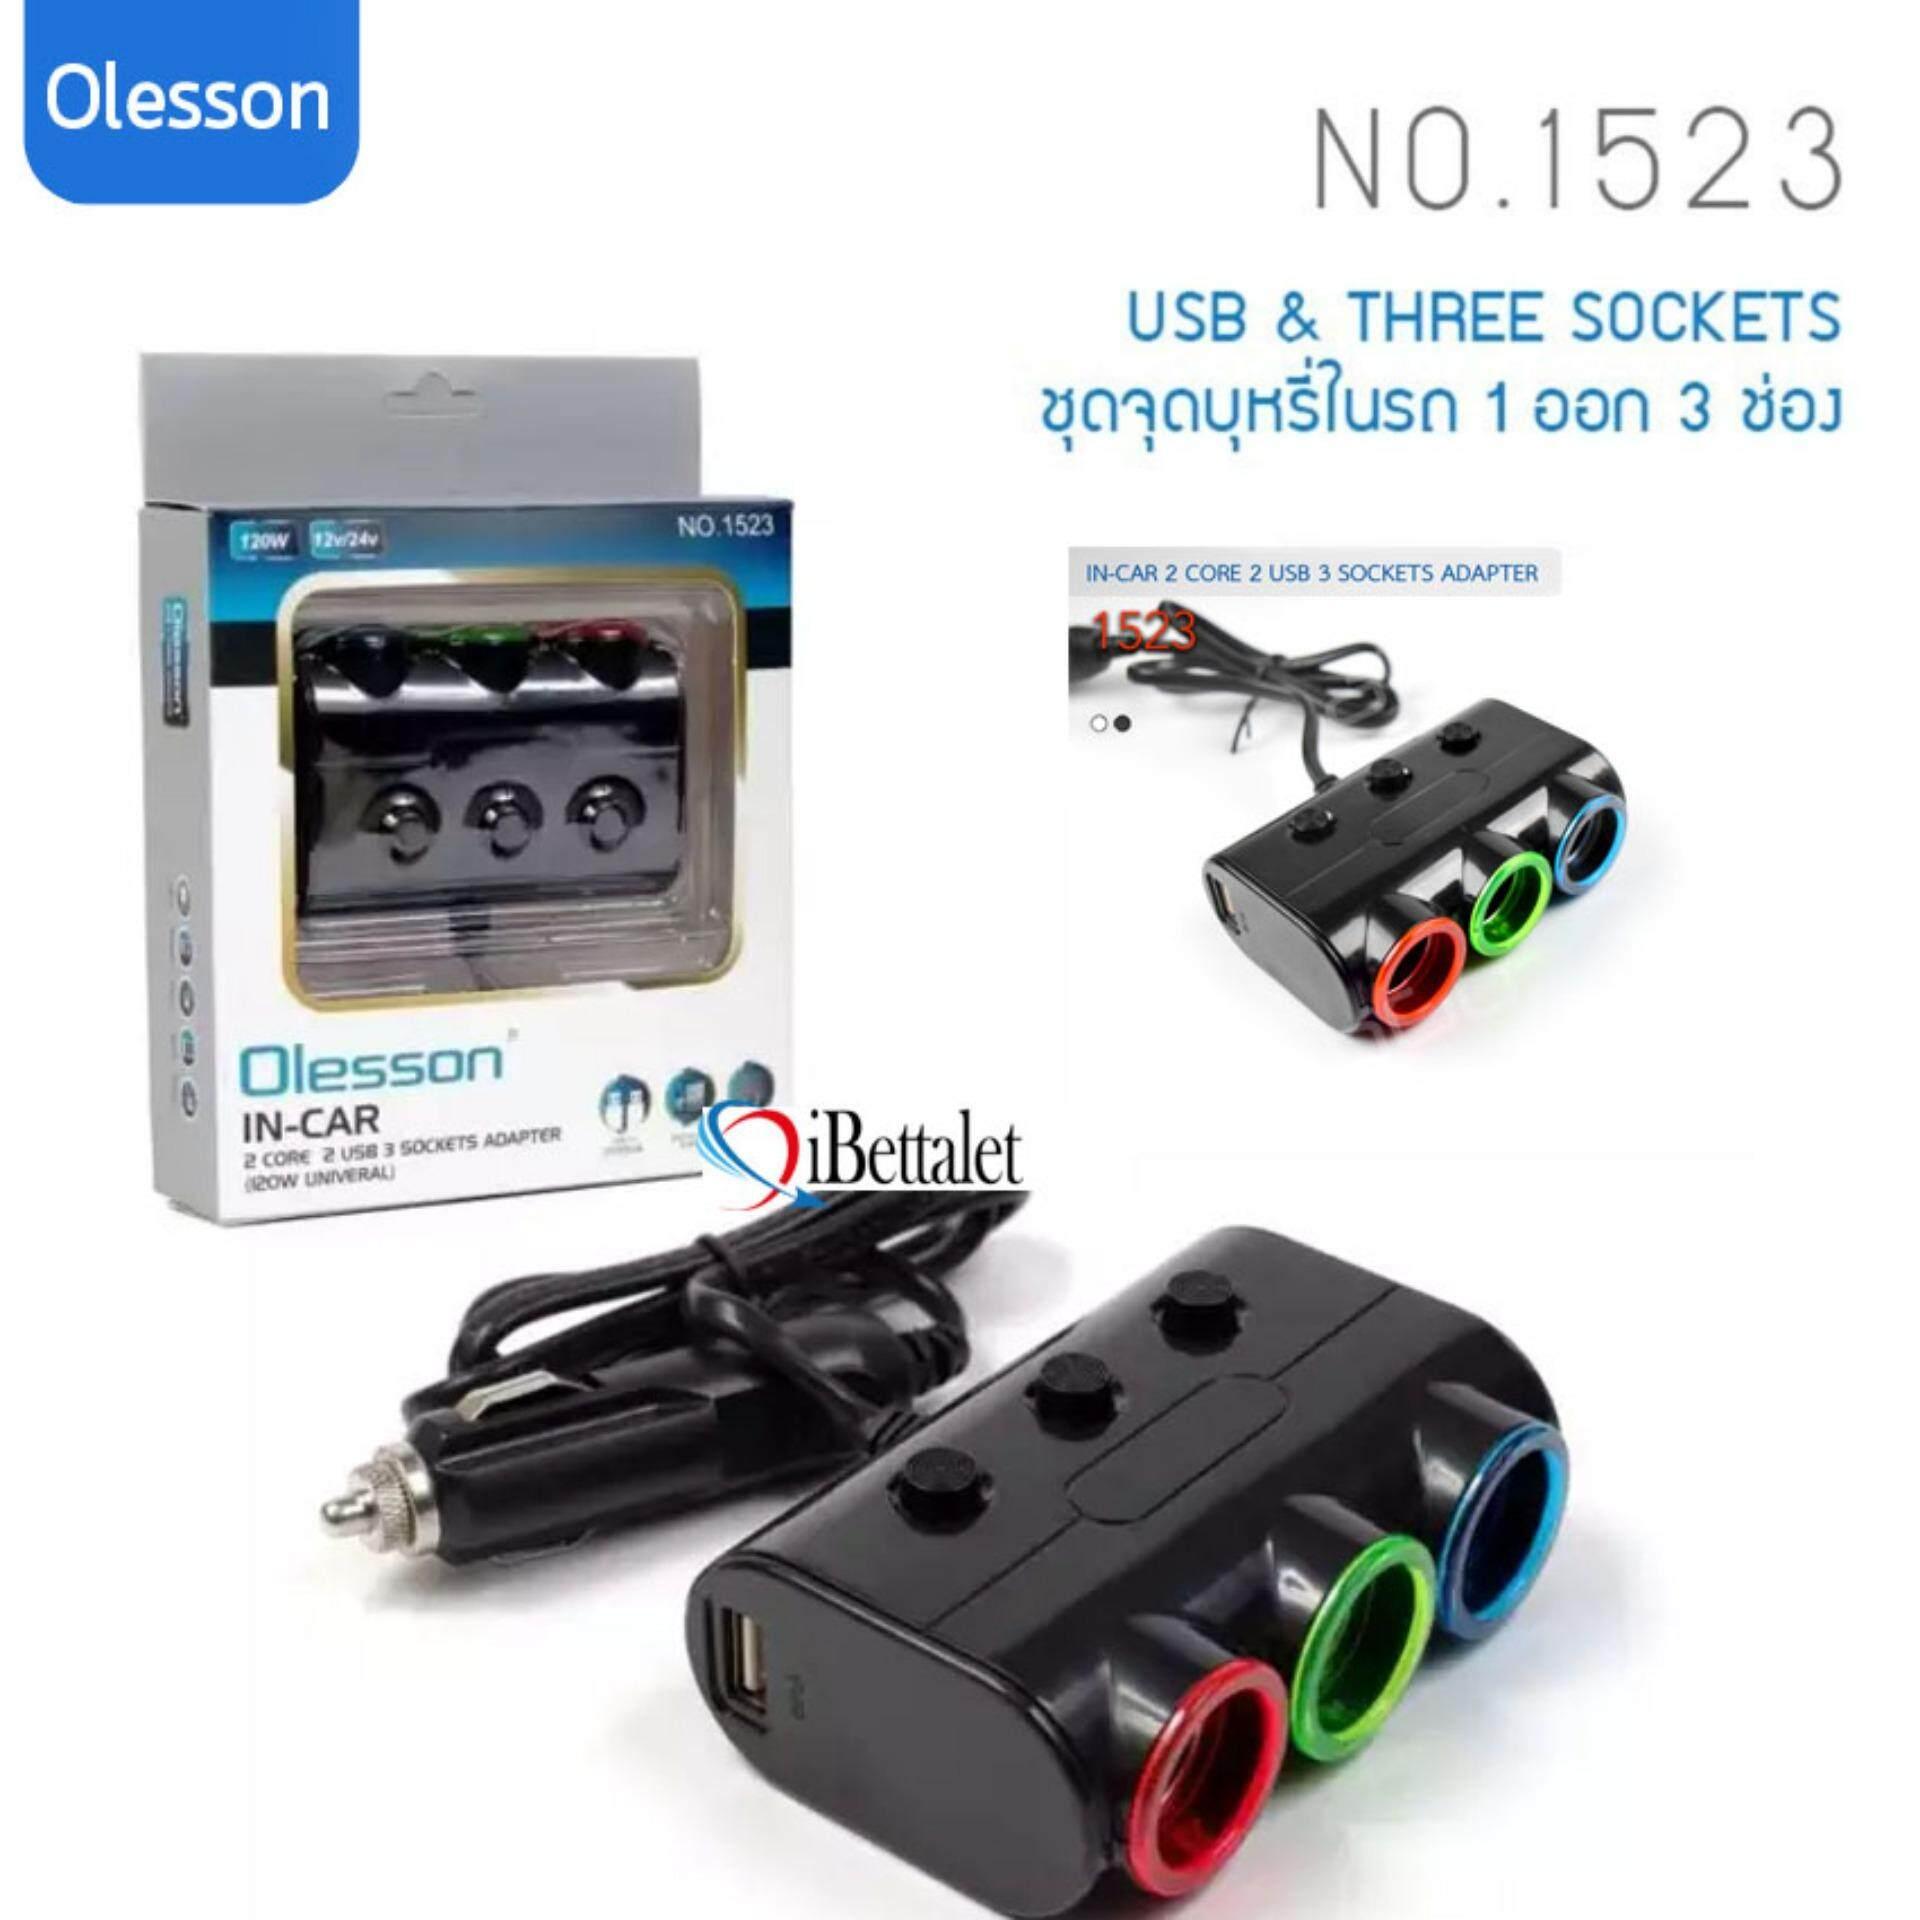 Olesson อุปกรณ์เพิ่มช่องจุดบุหรี่ 3 ช่องและช่อง 2 X Usb (1.0 & 2.1 A) - Black.